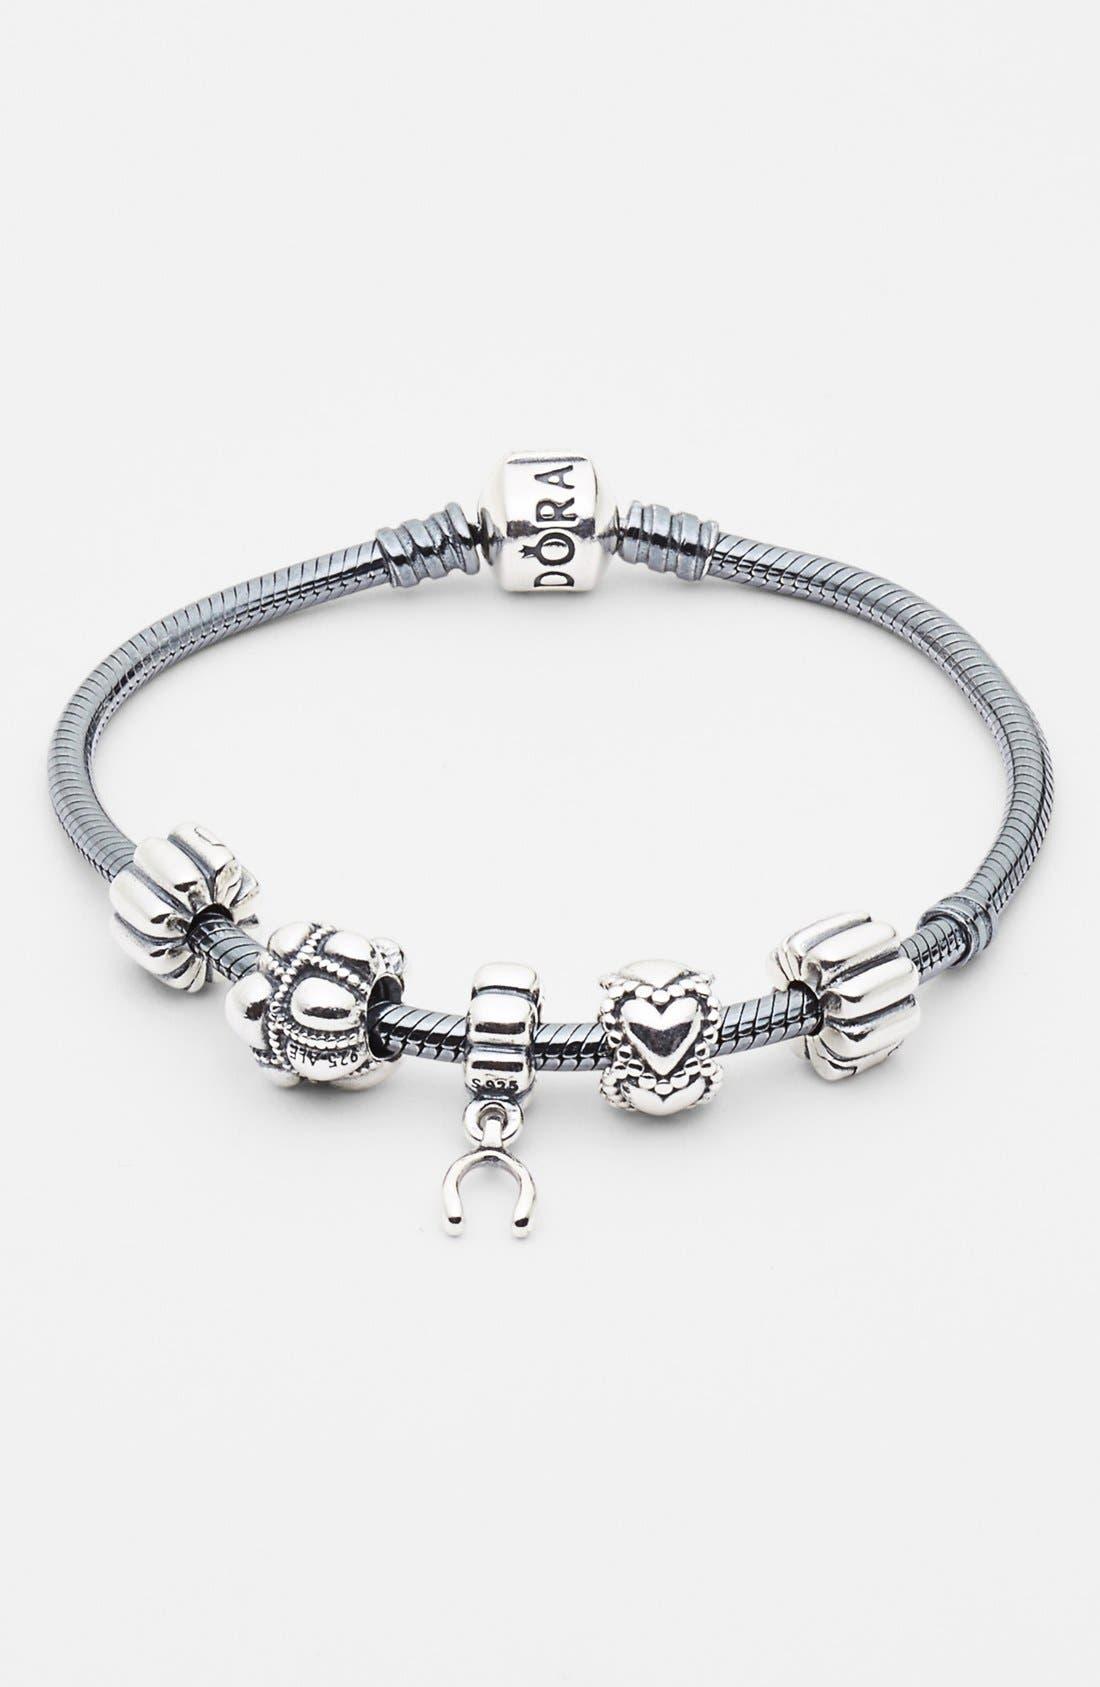 Oxidized Sterling Silver Charm Bracelet,                             Alternate thumbnail 5, color,